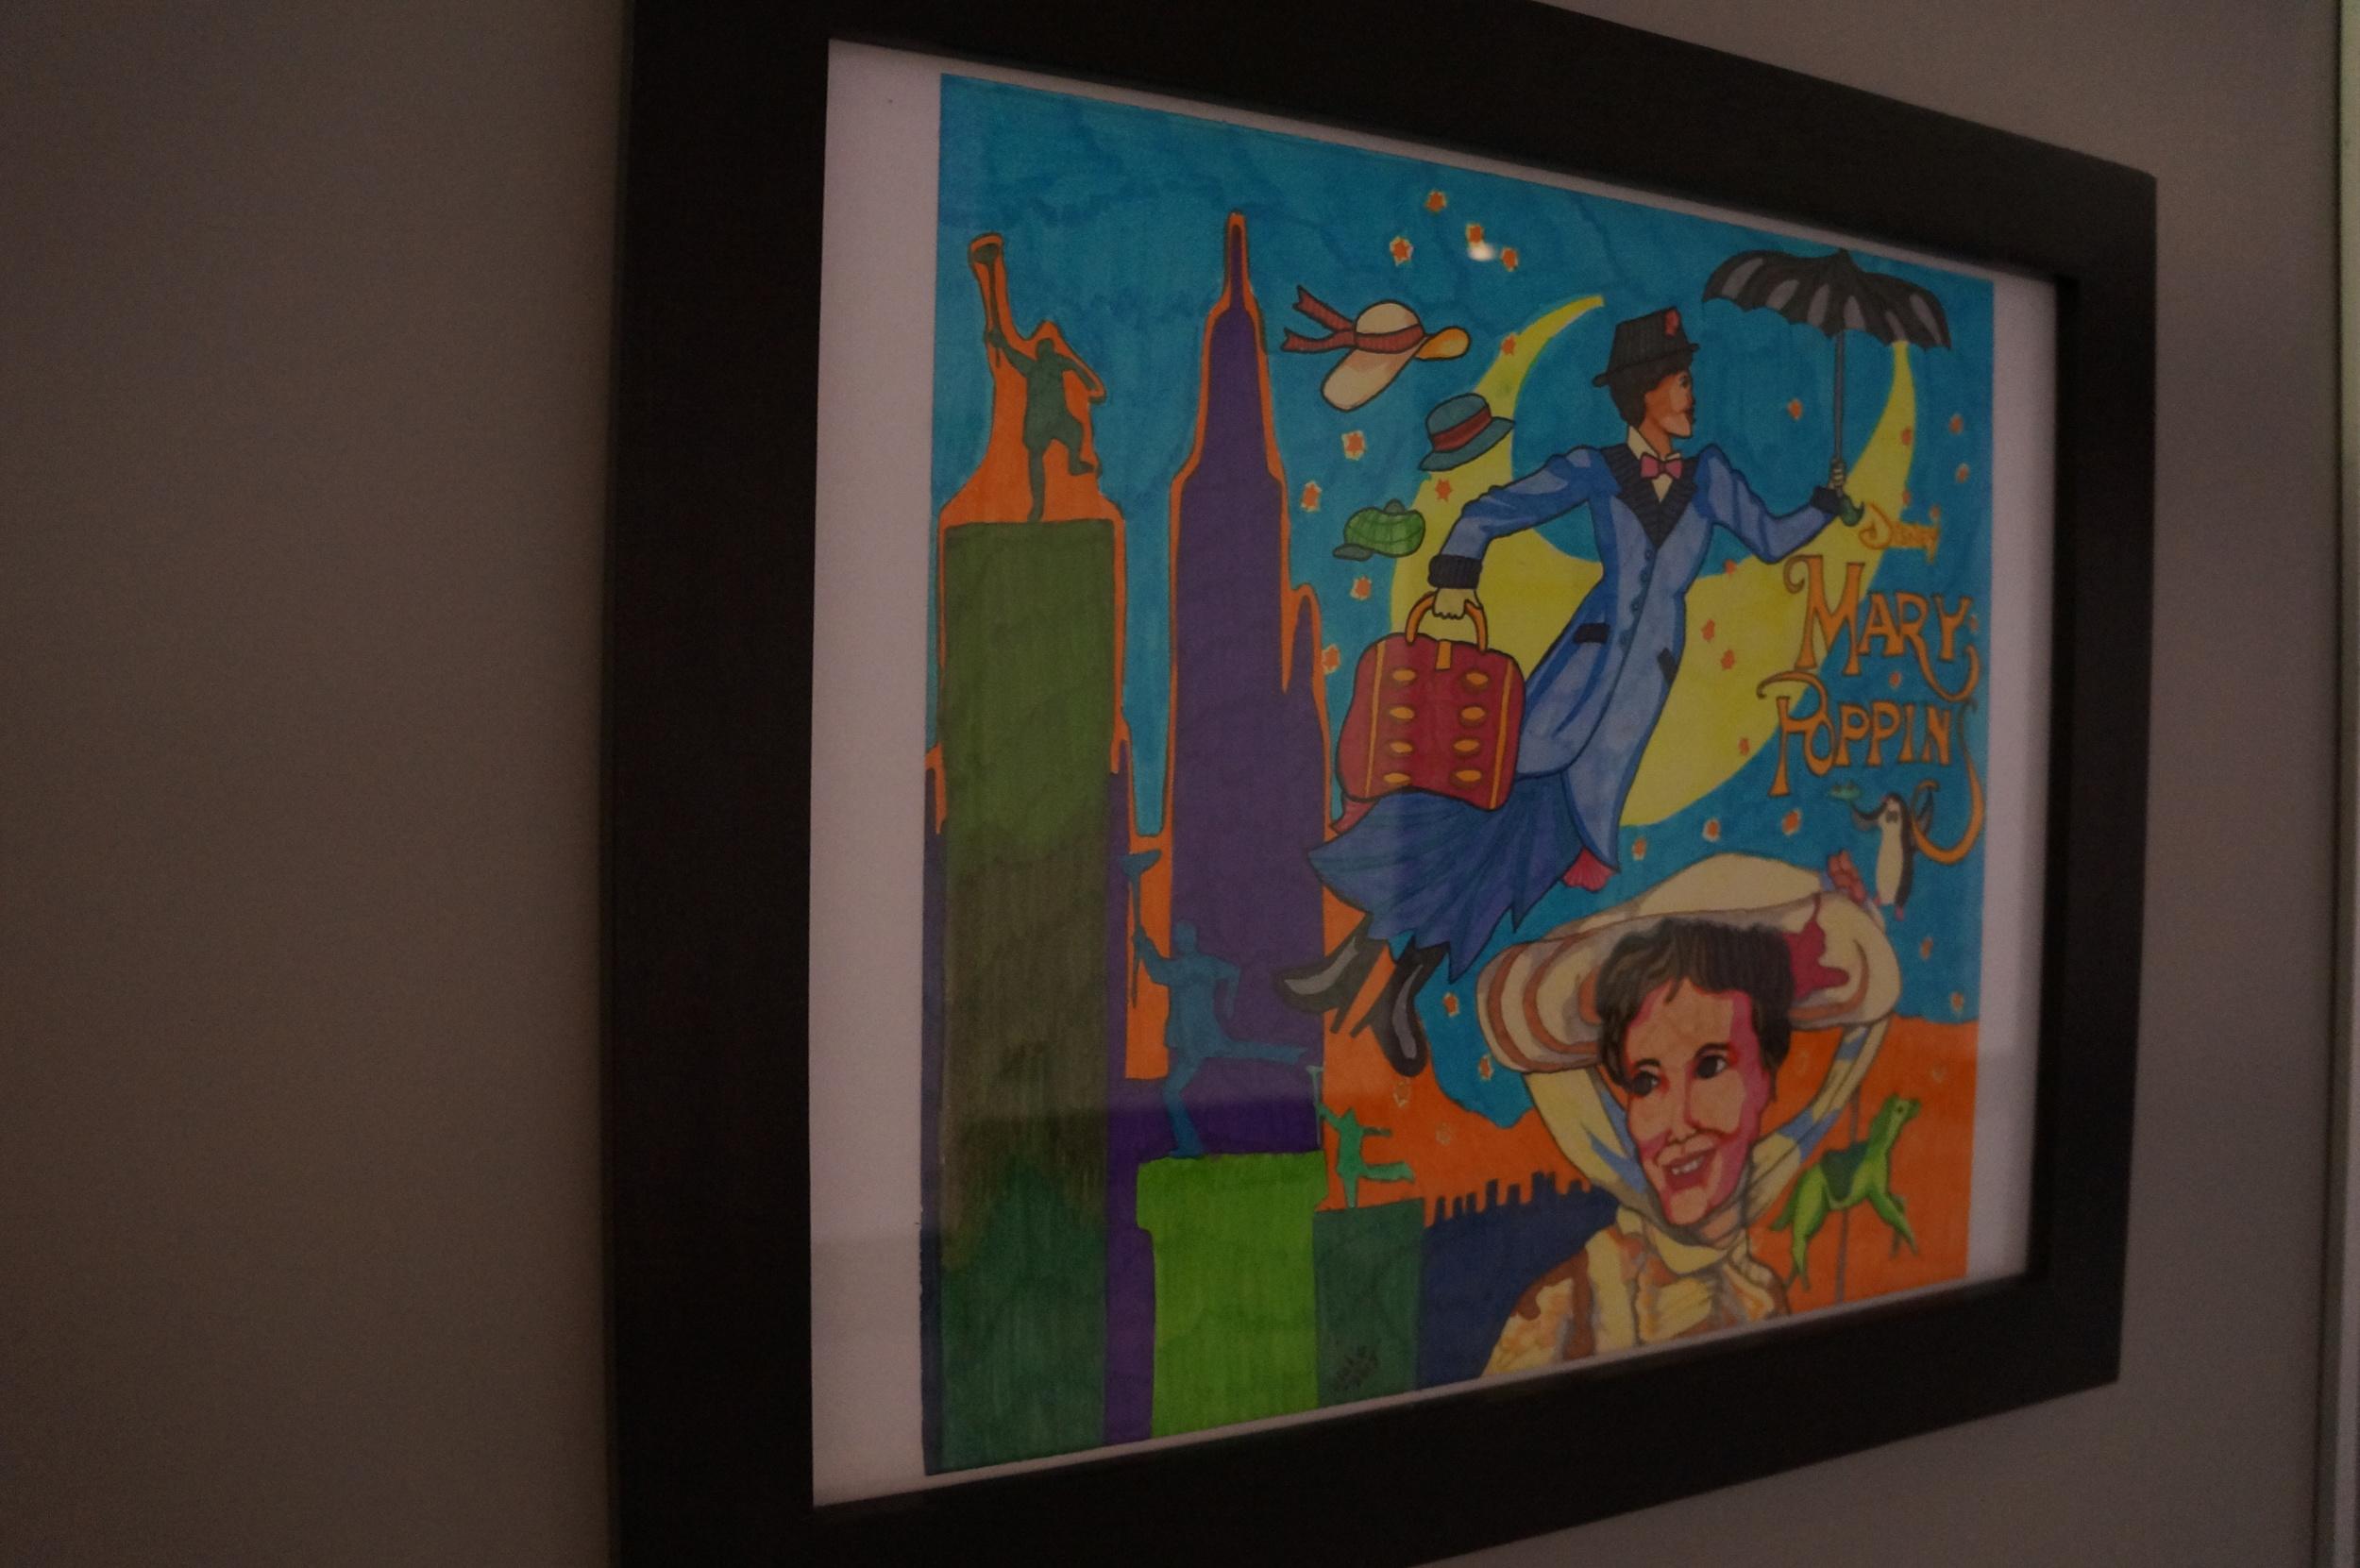 http://www.examiner.com/article/d23-expo-2013-recap-mary-poppins-fan-art-celebrates-50-years